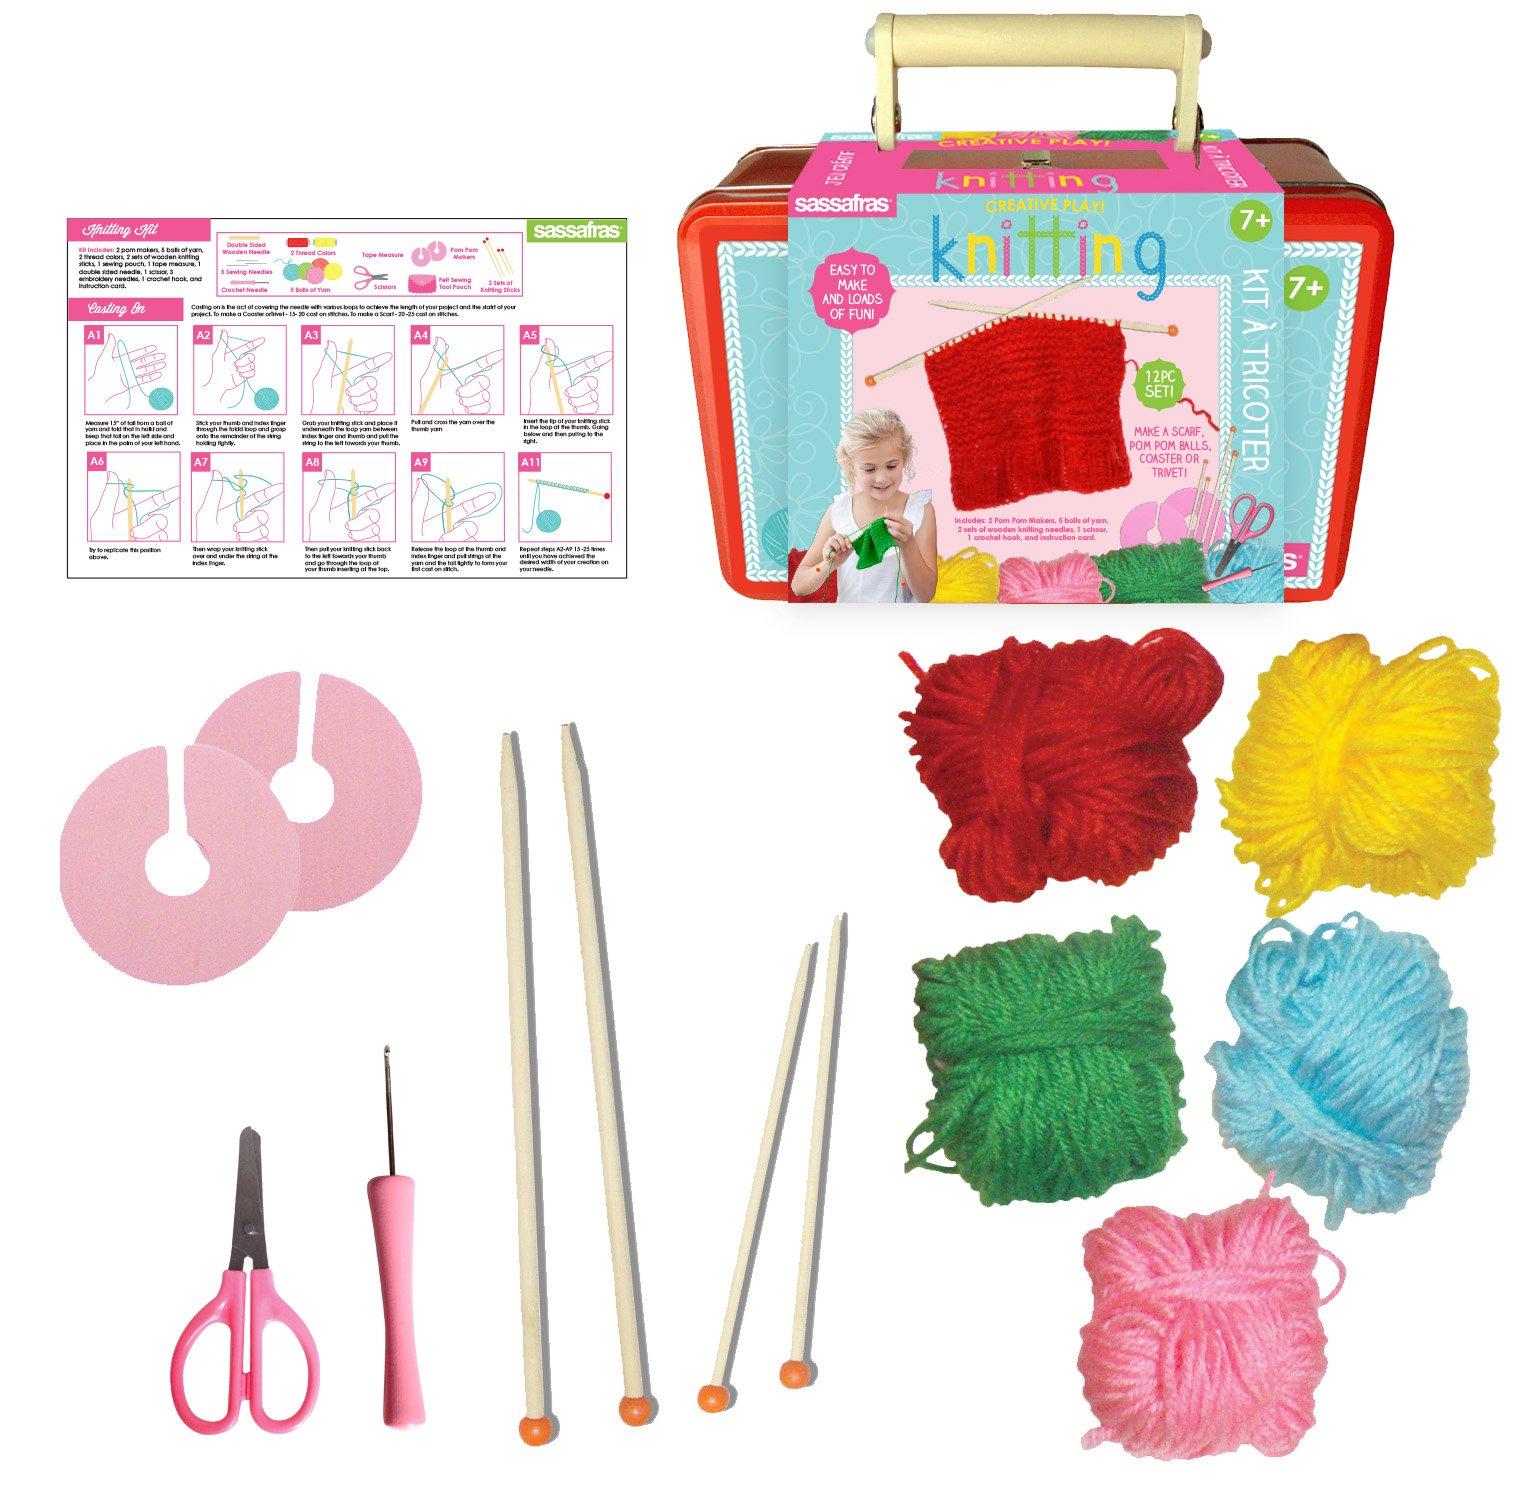 Sassafras Knitting Kit